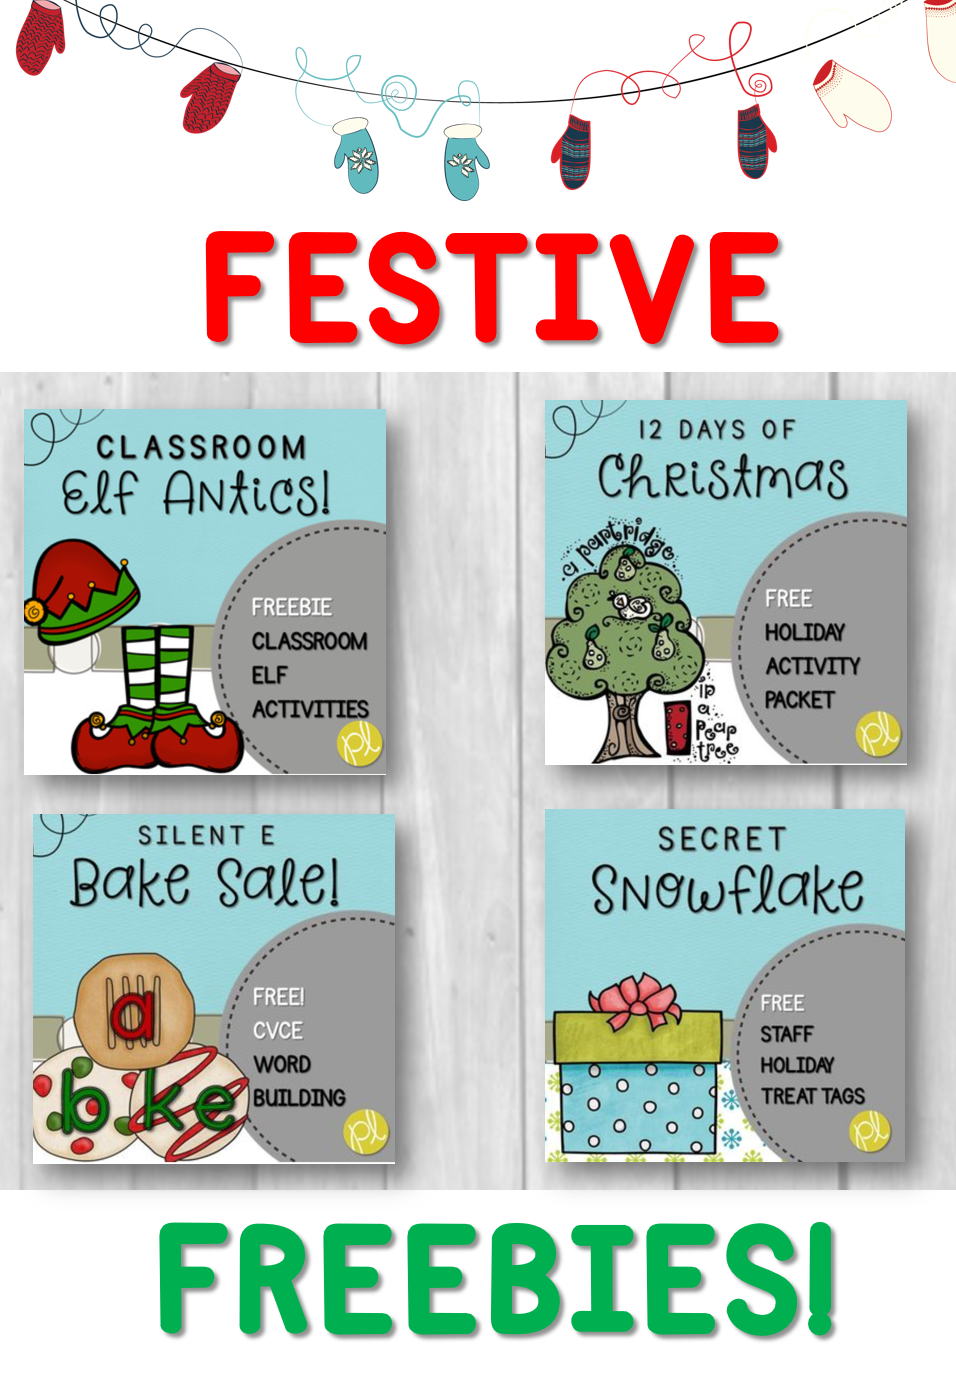 Festive Teaching Freebies!